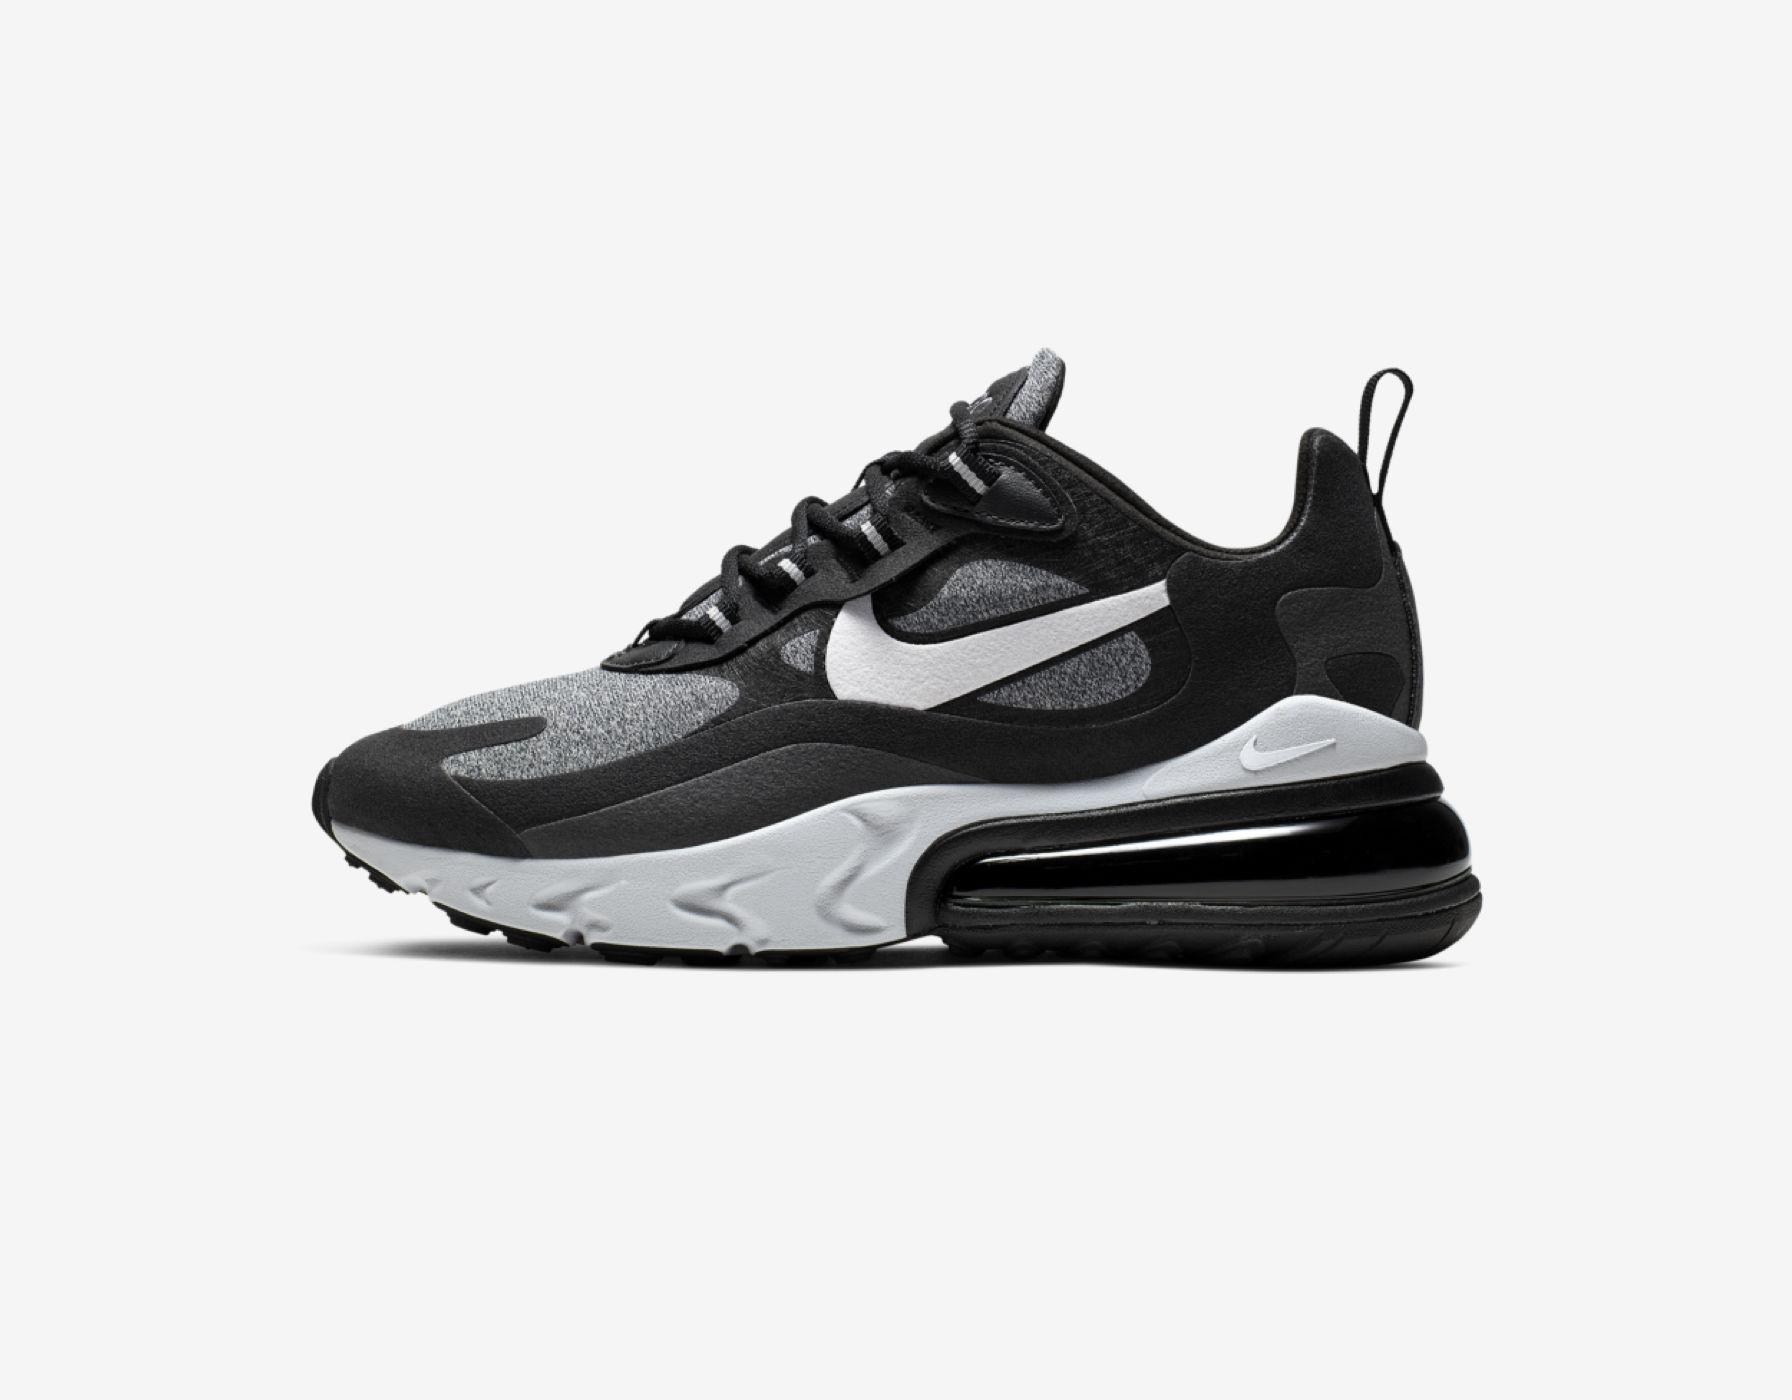 b90732c8 Nike. Just Do It. Nike.com